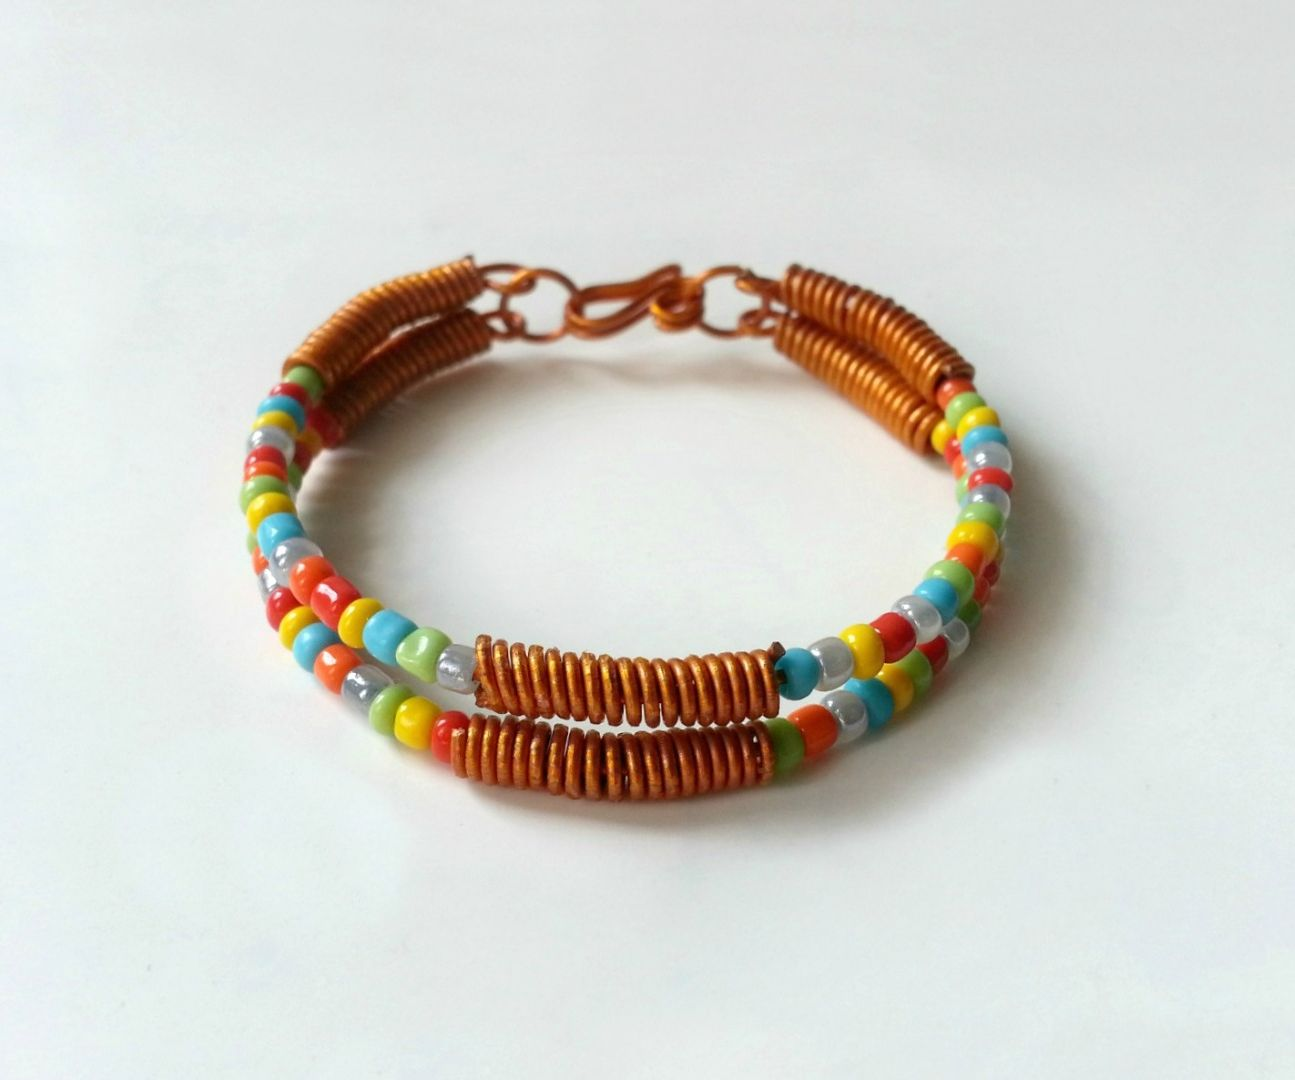 DIY Wire & Seed-Bead Bracelet